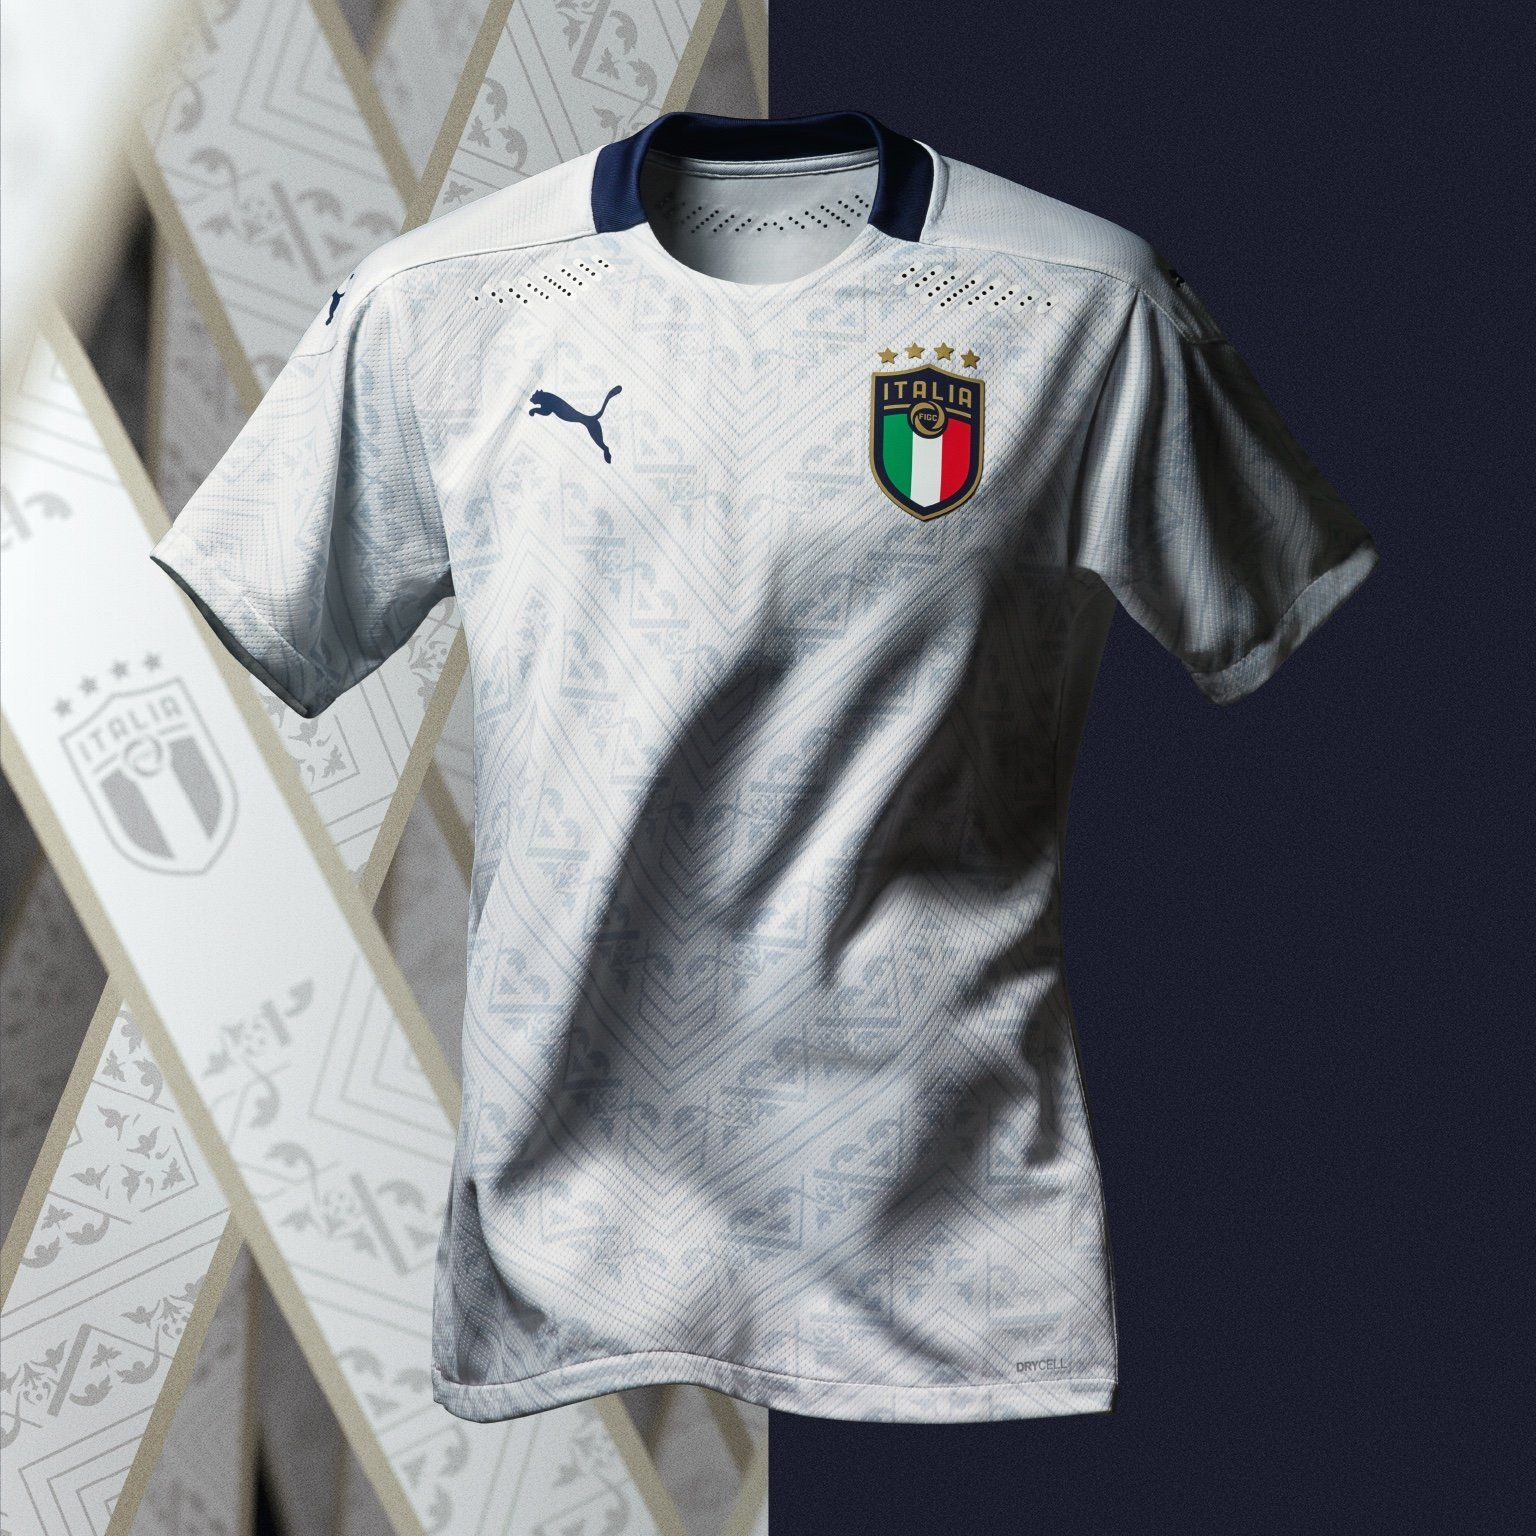 2020 Euro Italy Away White Soccer Jersey Shirt Soccer Shirts Soccer Jersey Football Shirts